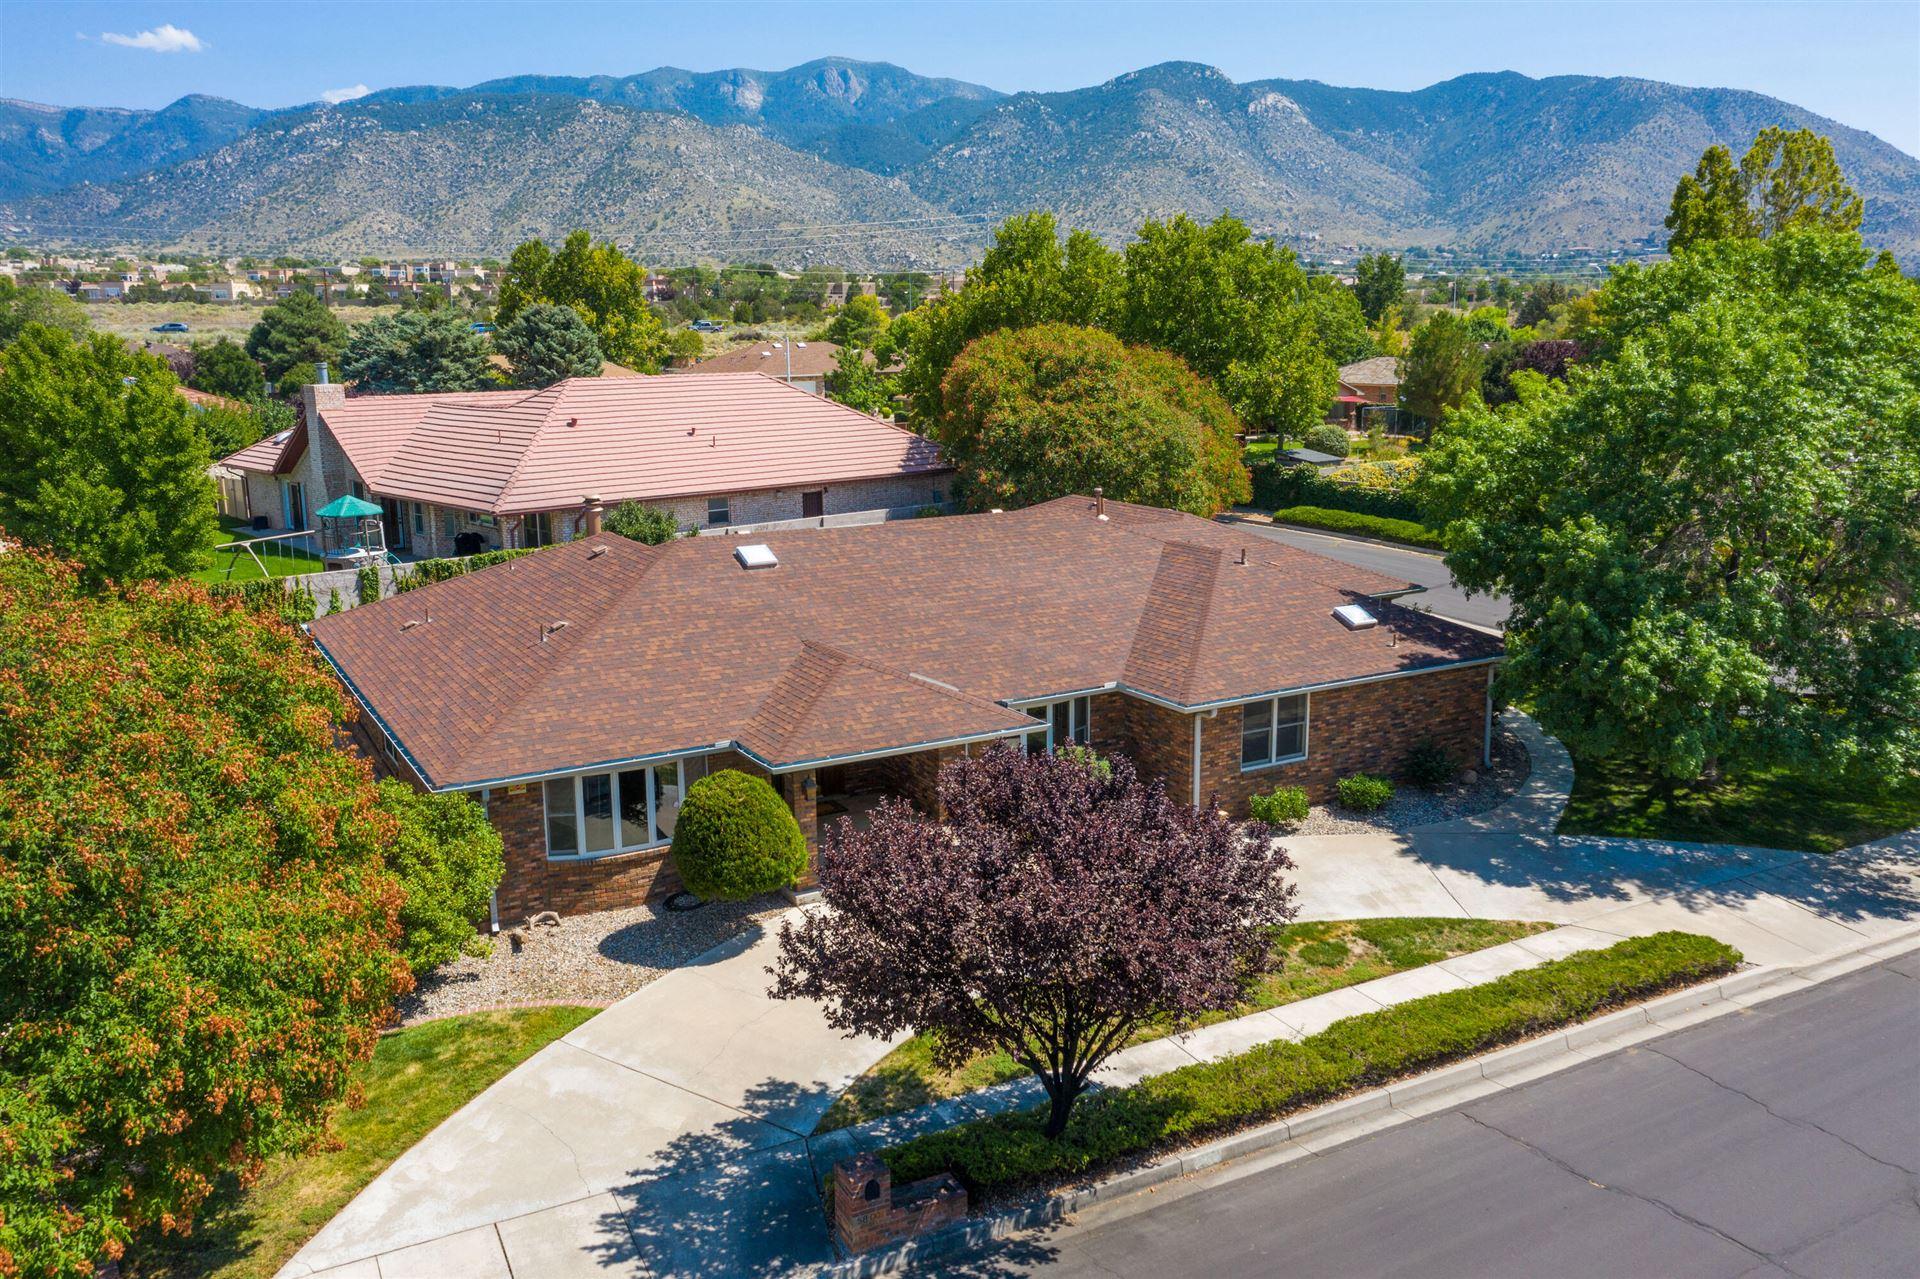 5800 ROYAL OAK Drive NE, Albuquerque, NM 87111 - MLS#: 1000513